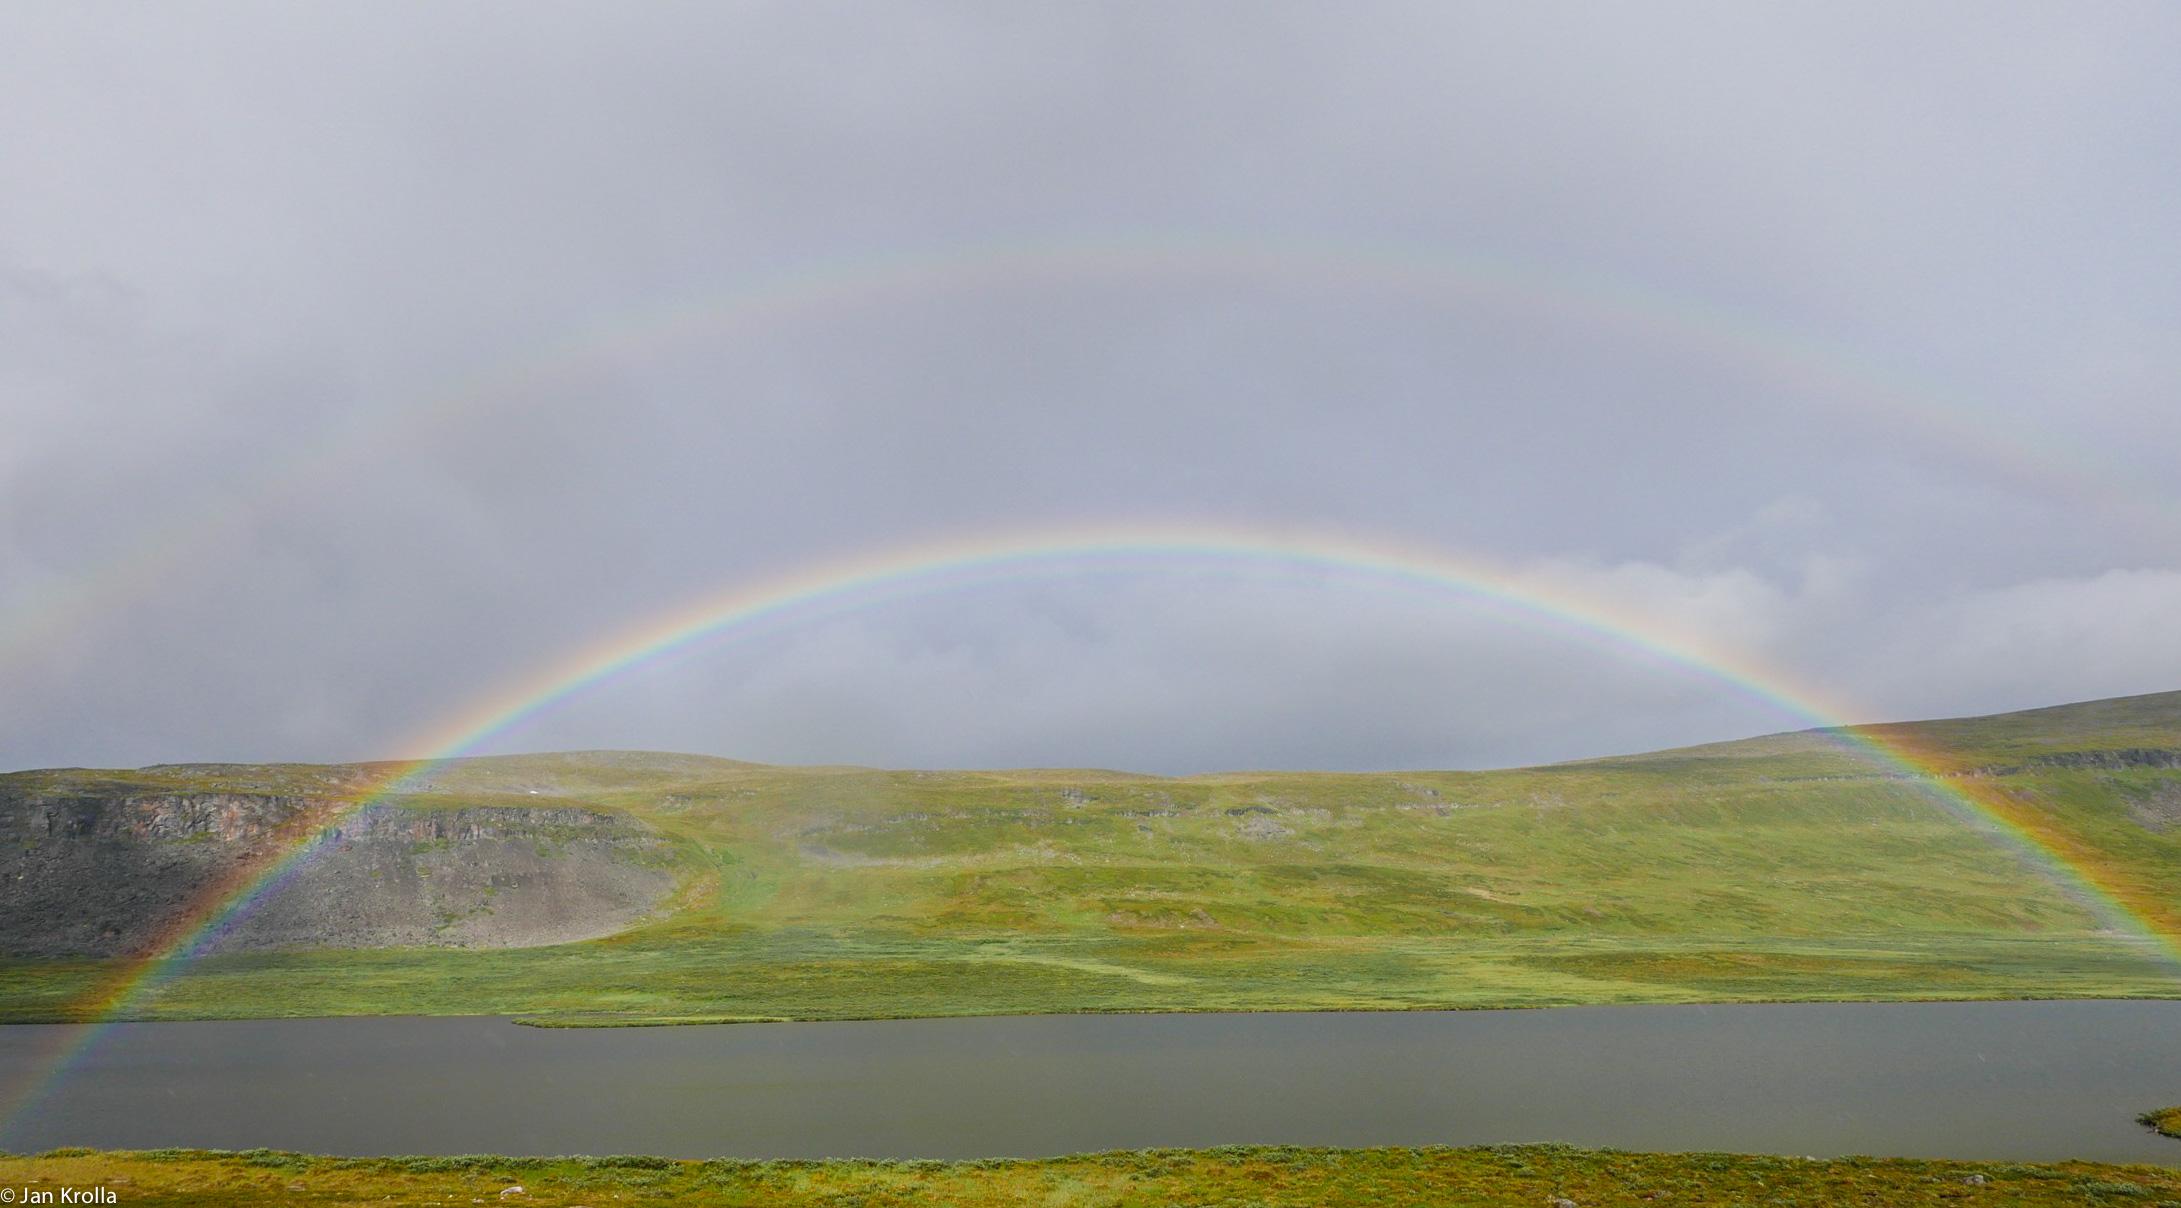 Doppelter Regenbogen im Øvre Dividal Nationalpark